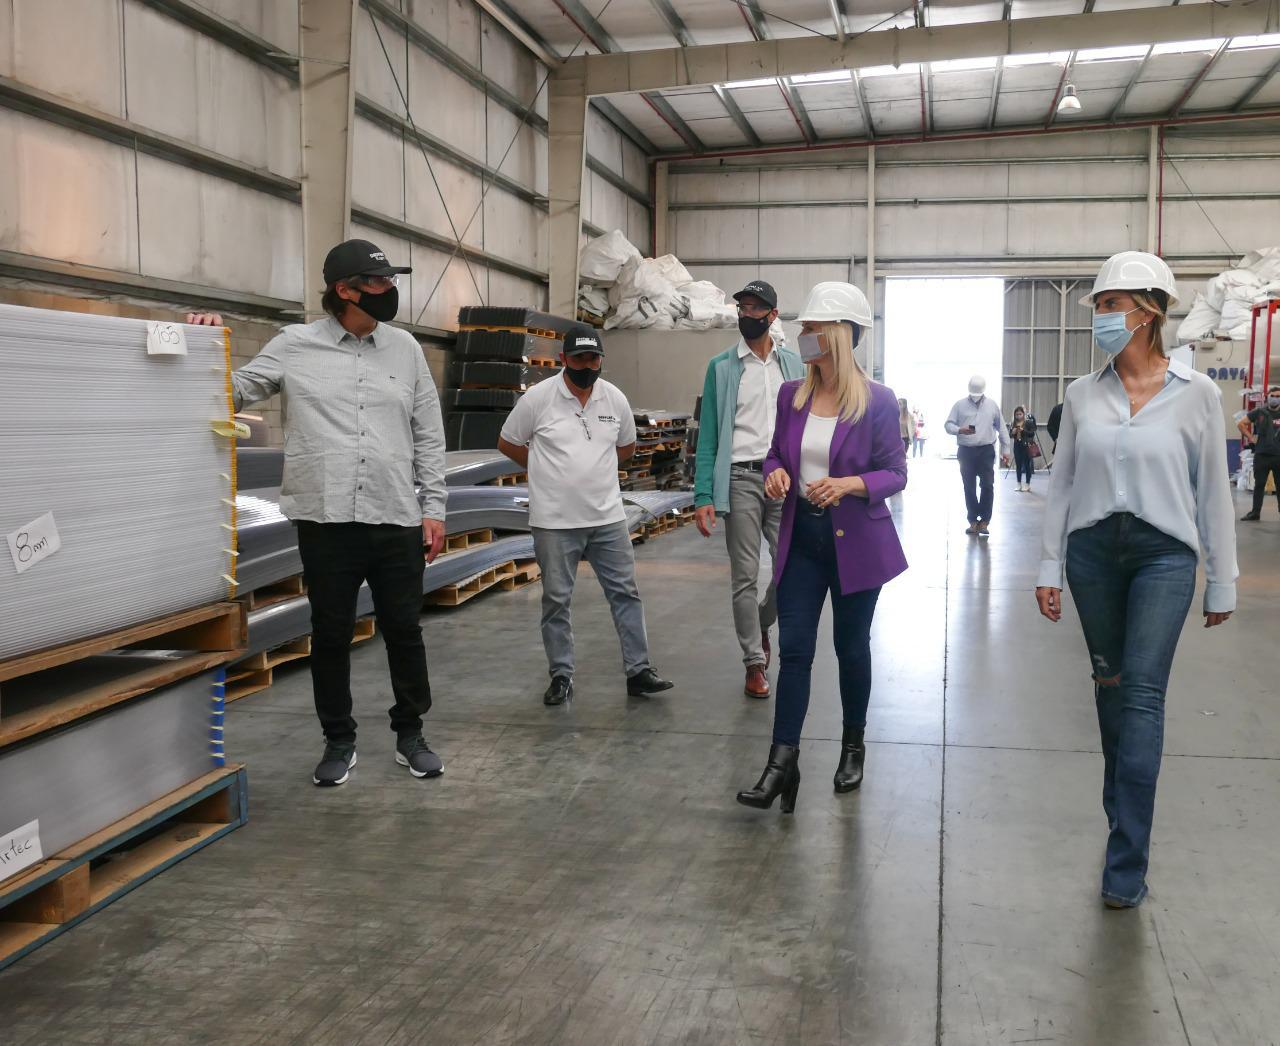 15-10 visita de la vicegobernadora Magario a Cañuelas (1)